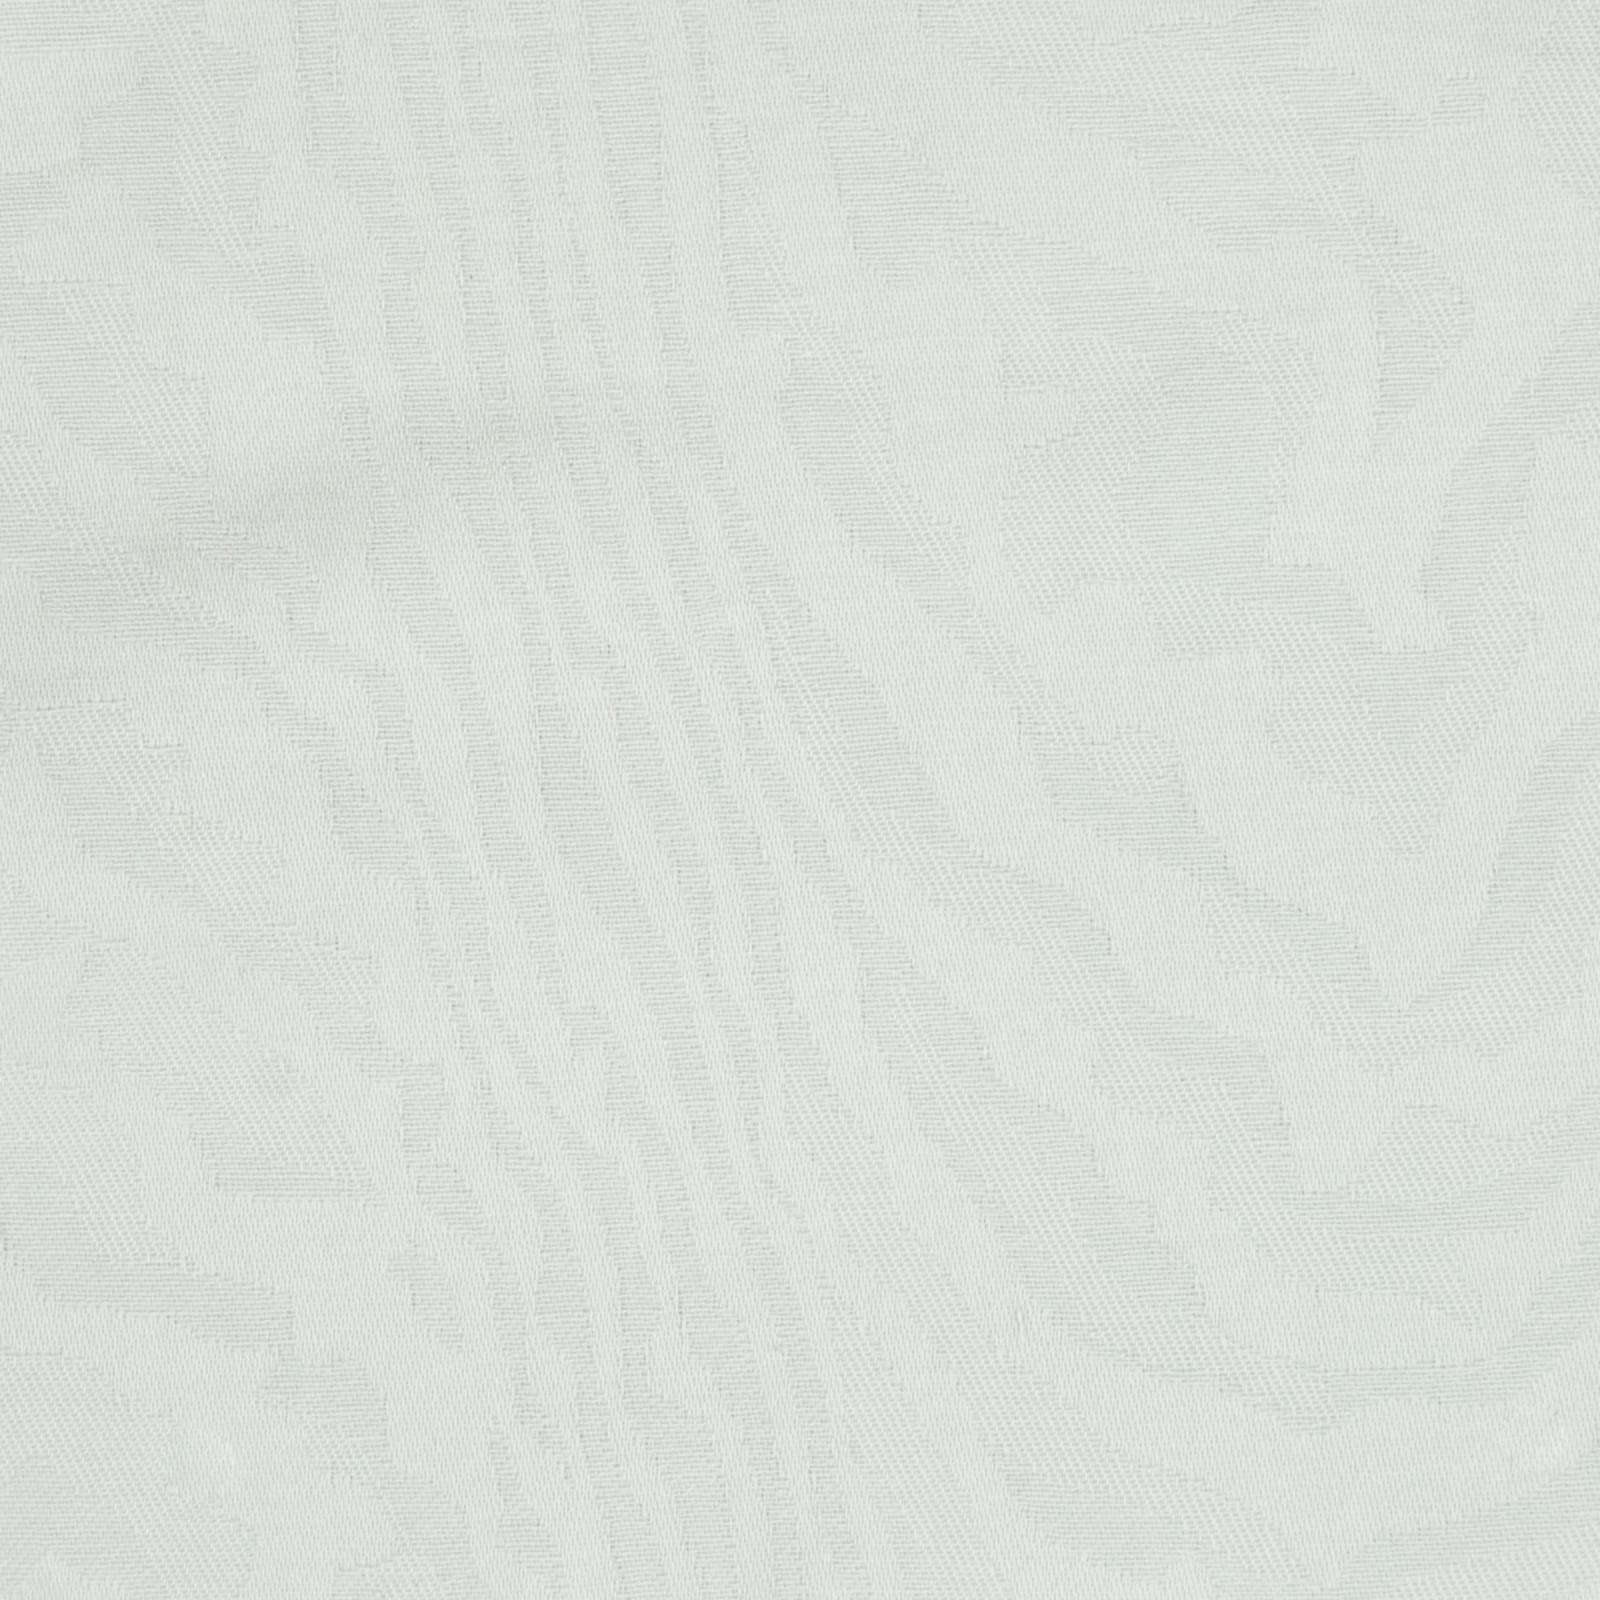 B1185 Seaglass Greenhouse Fabrics